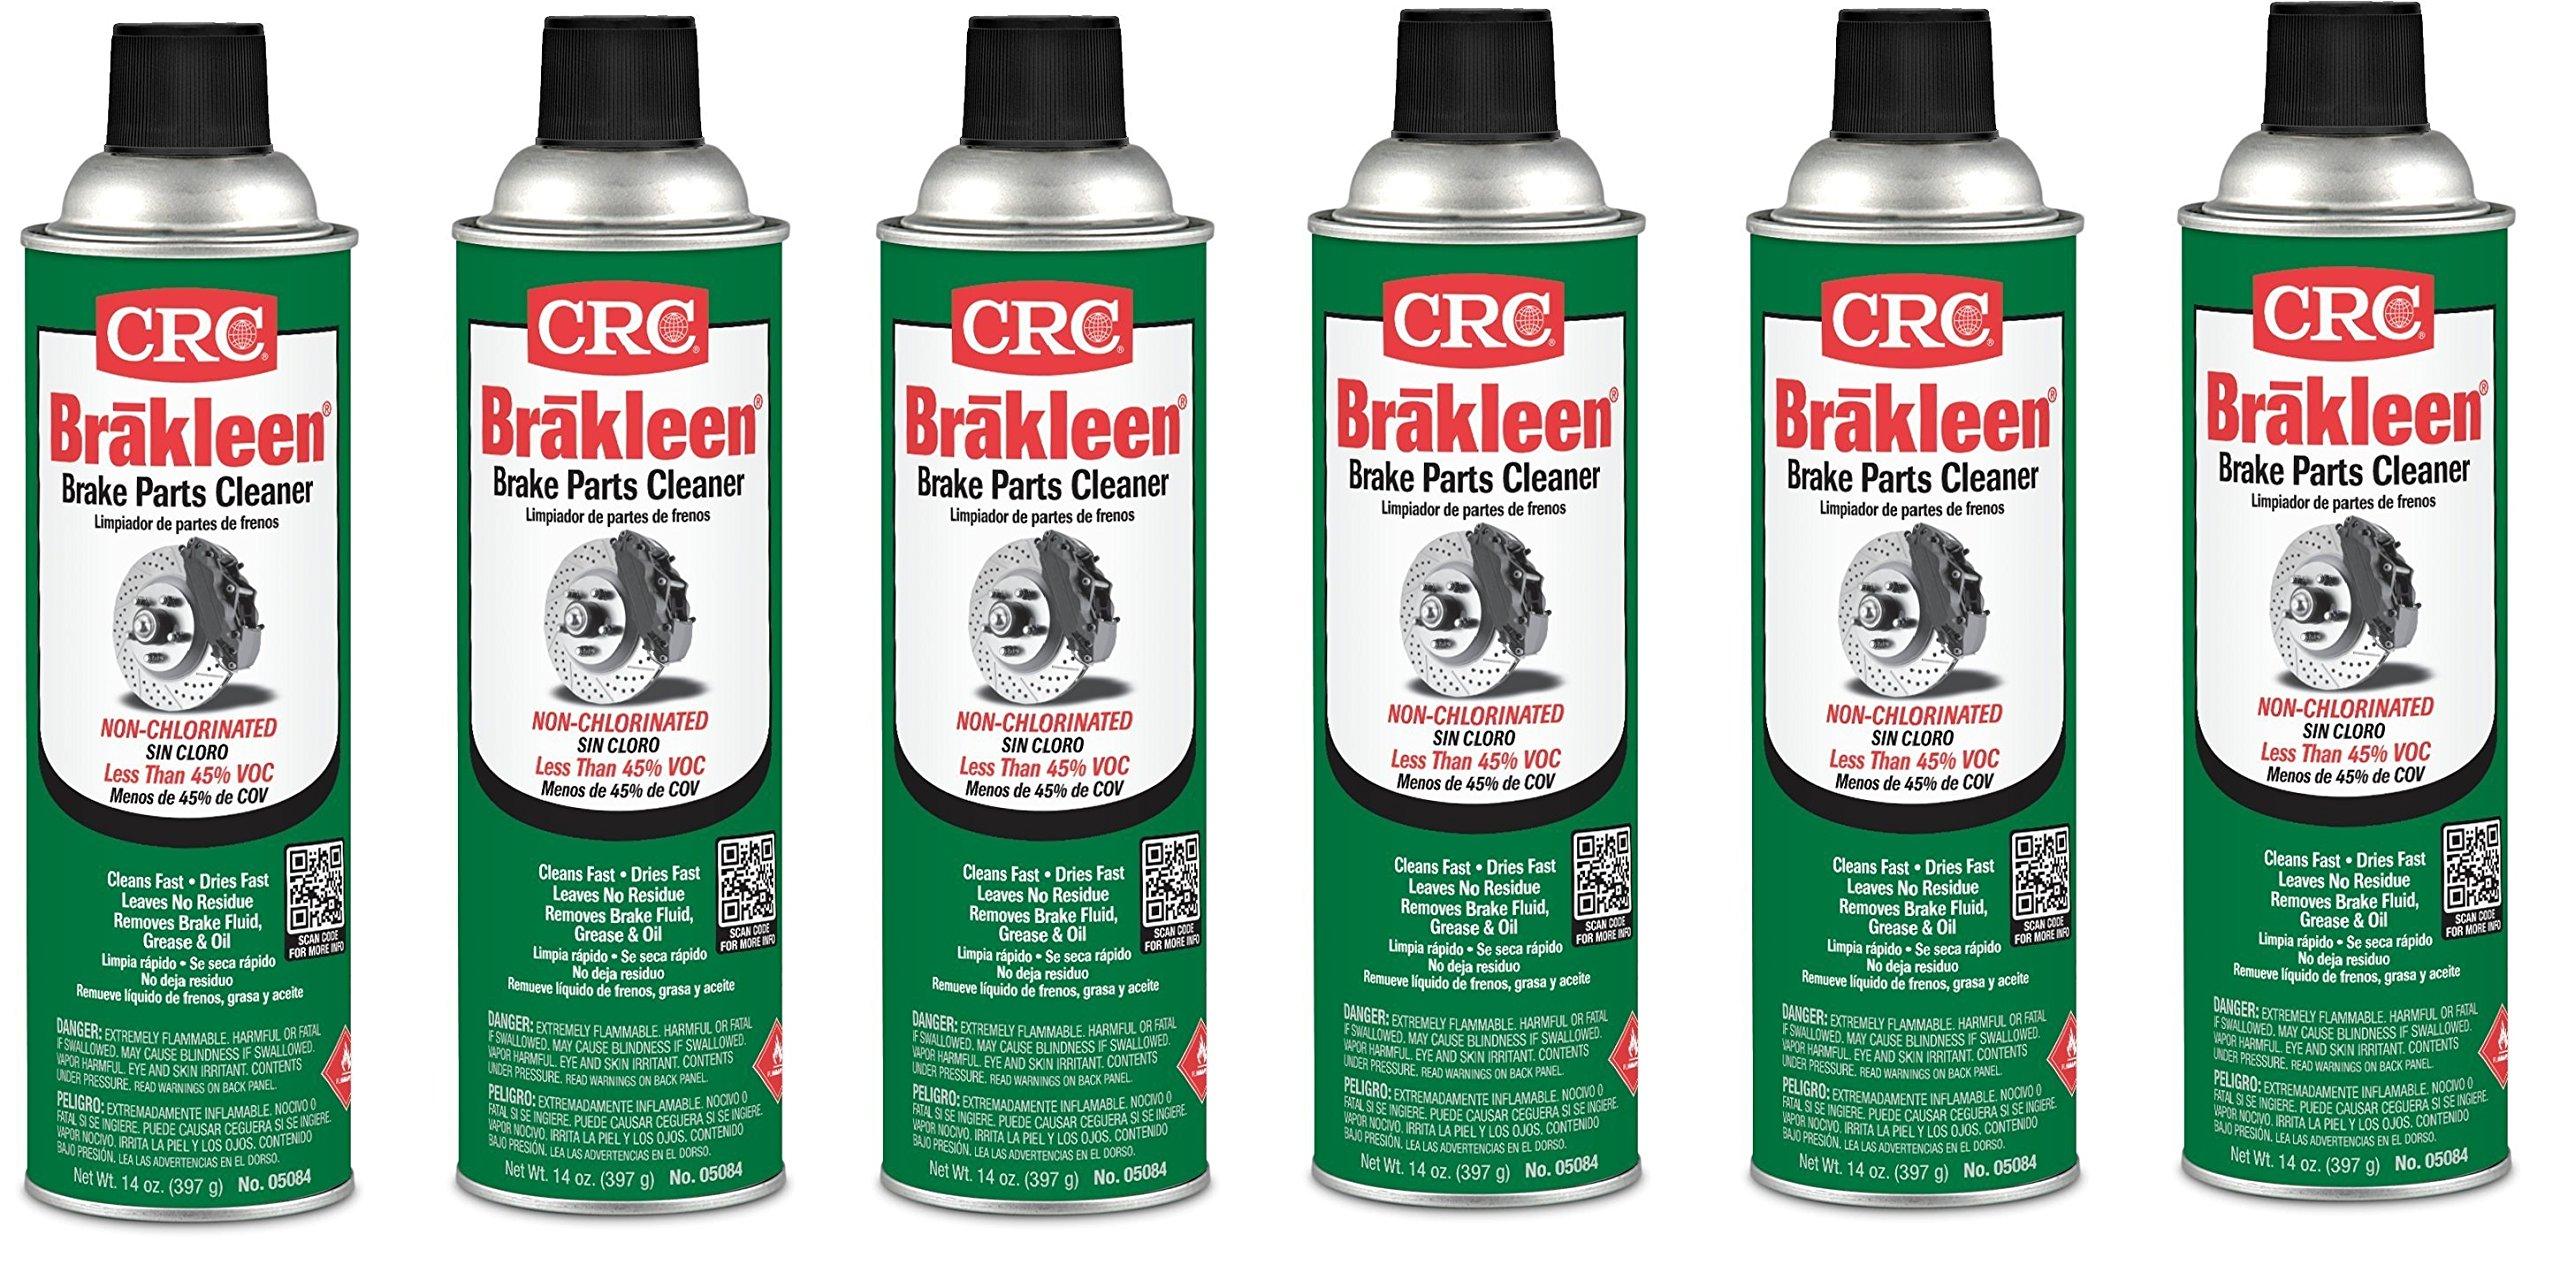 CRC 05084 BRAKLEEN Brake Parts Cleaner - Non-Chlorinated - 14 Wt Oz (6)